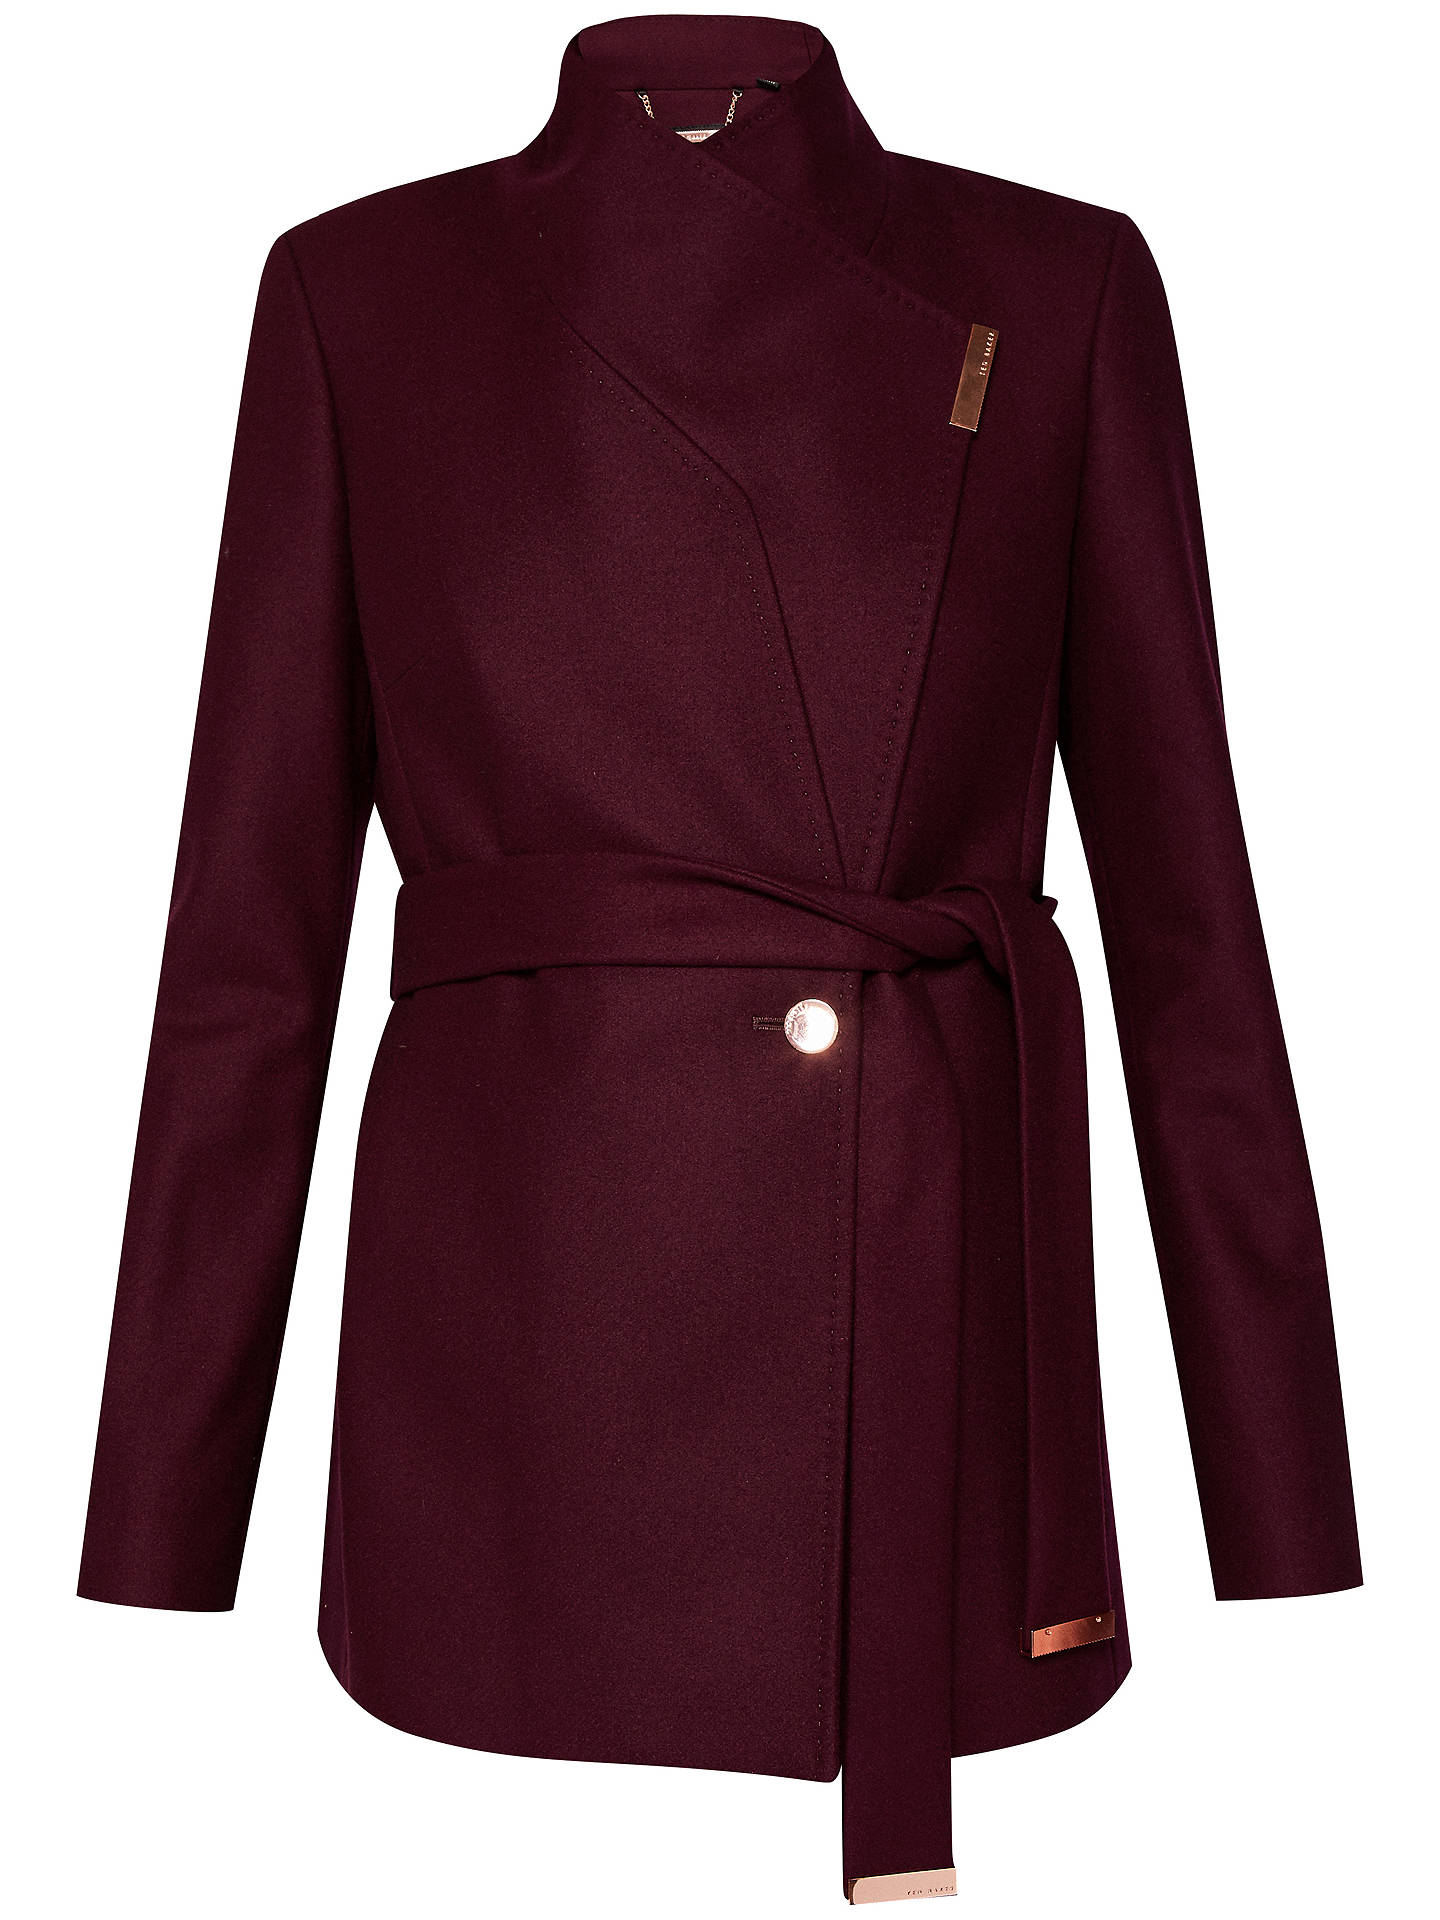 buy good genuine shoes save up to 80% Ted Baker Keyla Short Wrap Coat at John Lewis & Partners